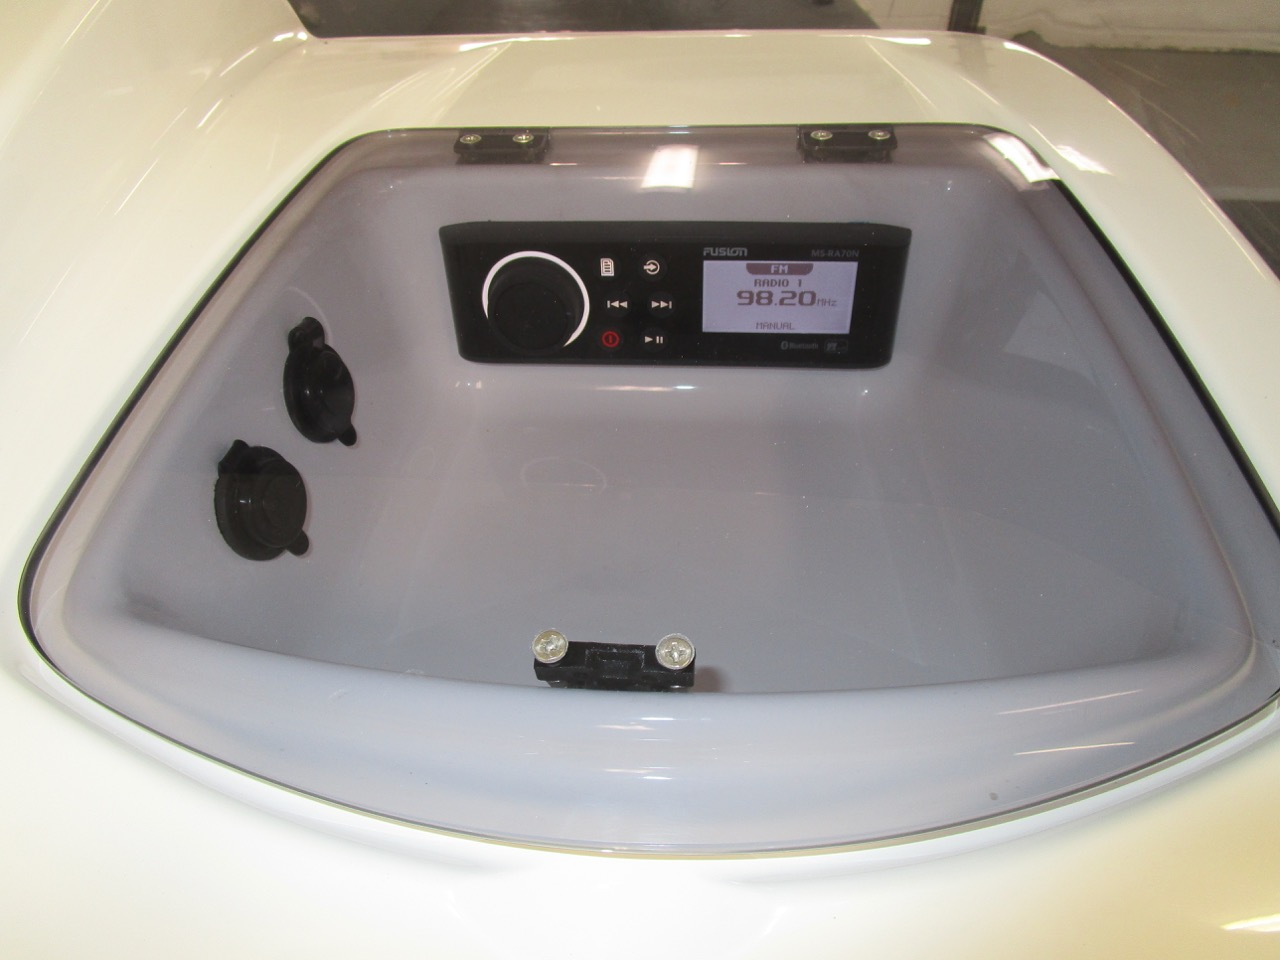 Eagle 780 - Fusion stereo locker on console